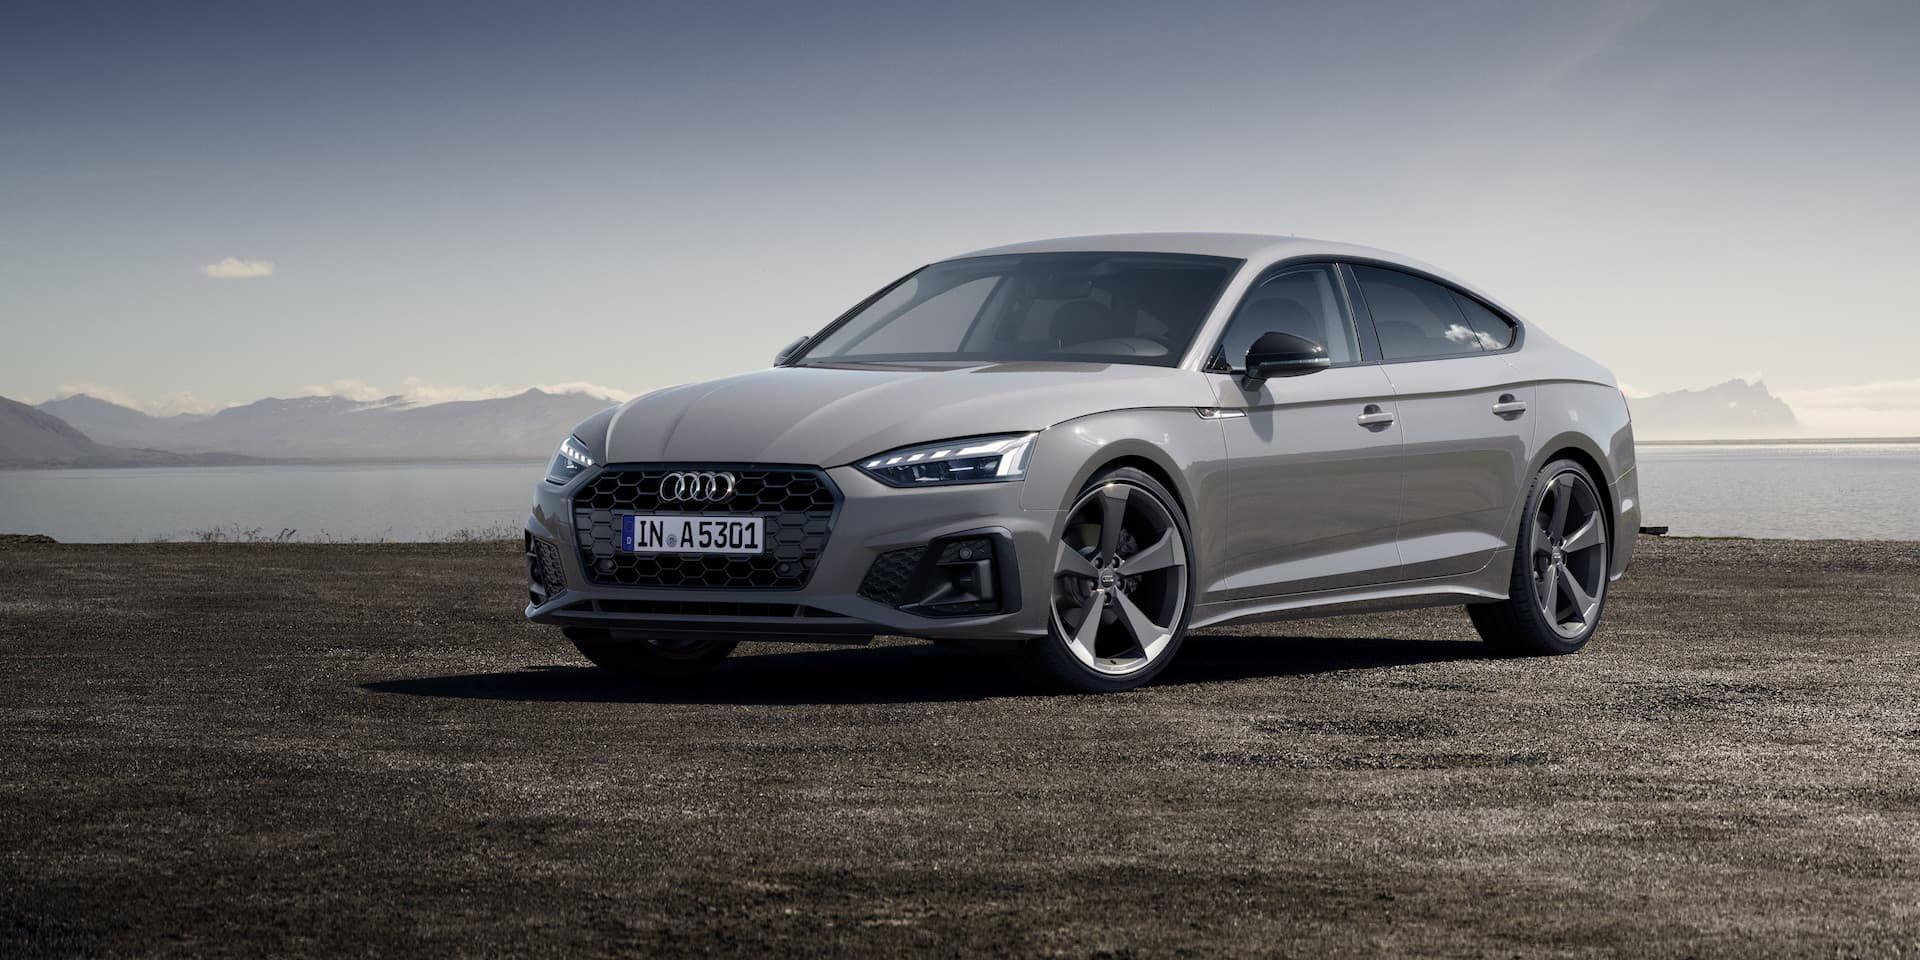 2020 Audi A5 Sportback facelift wallpaper | The Car Expert